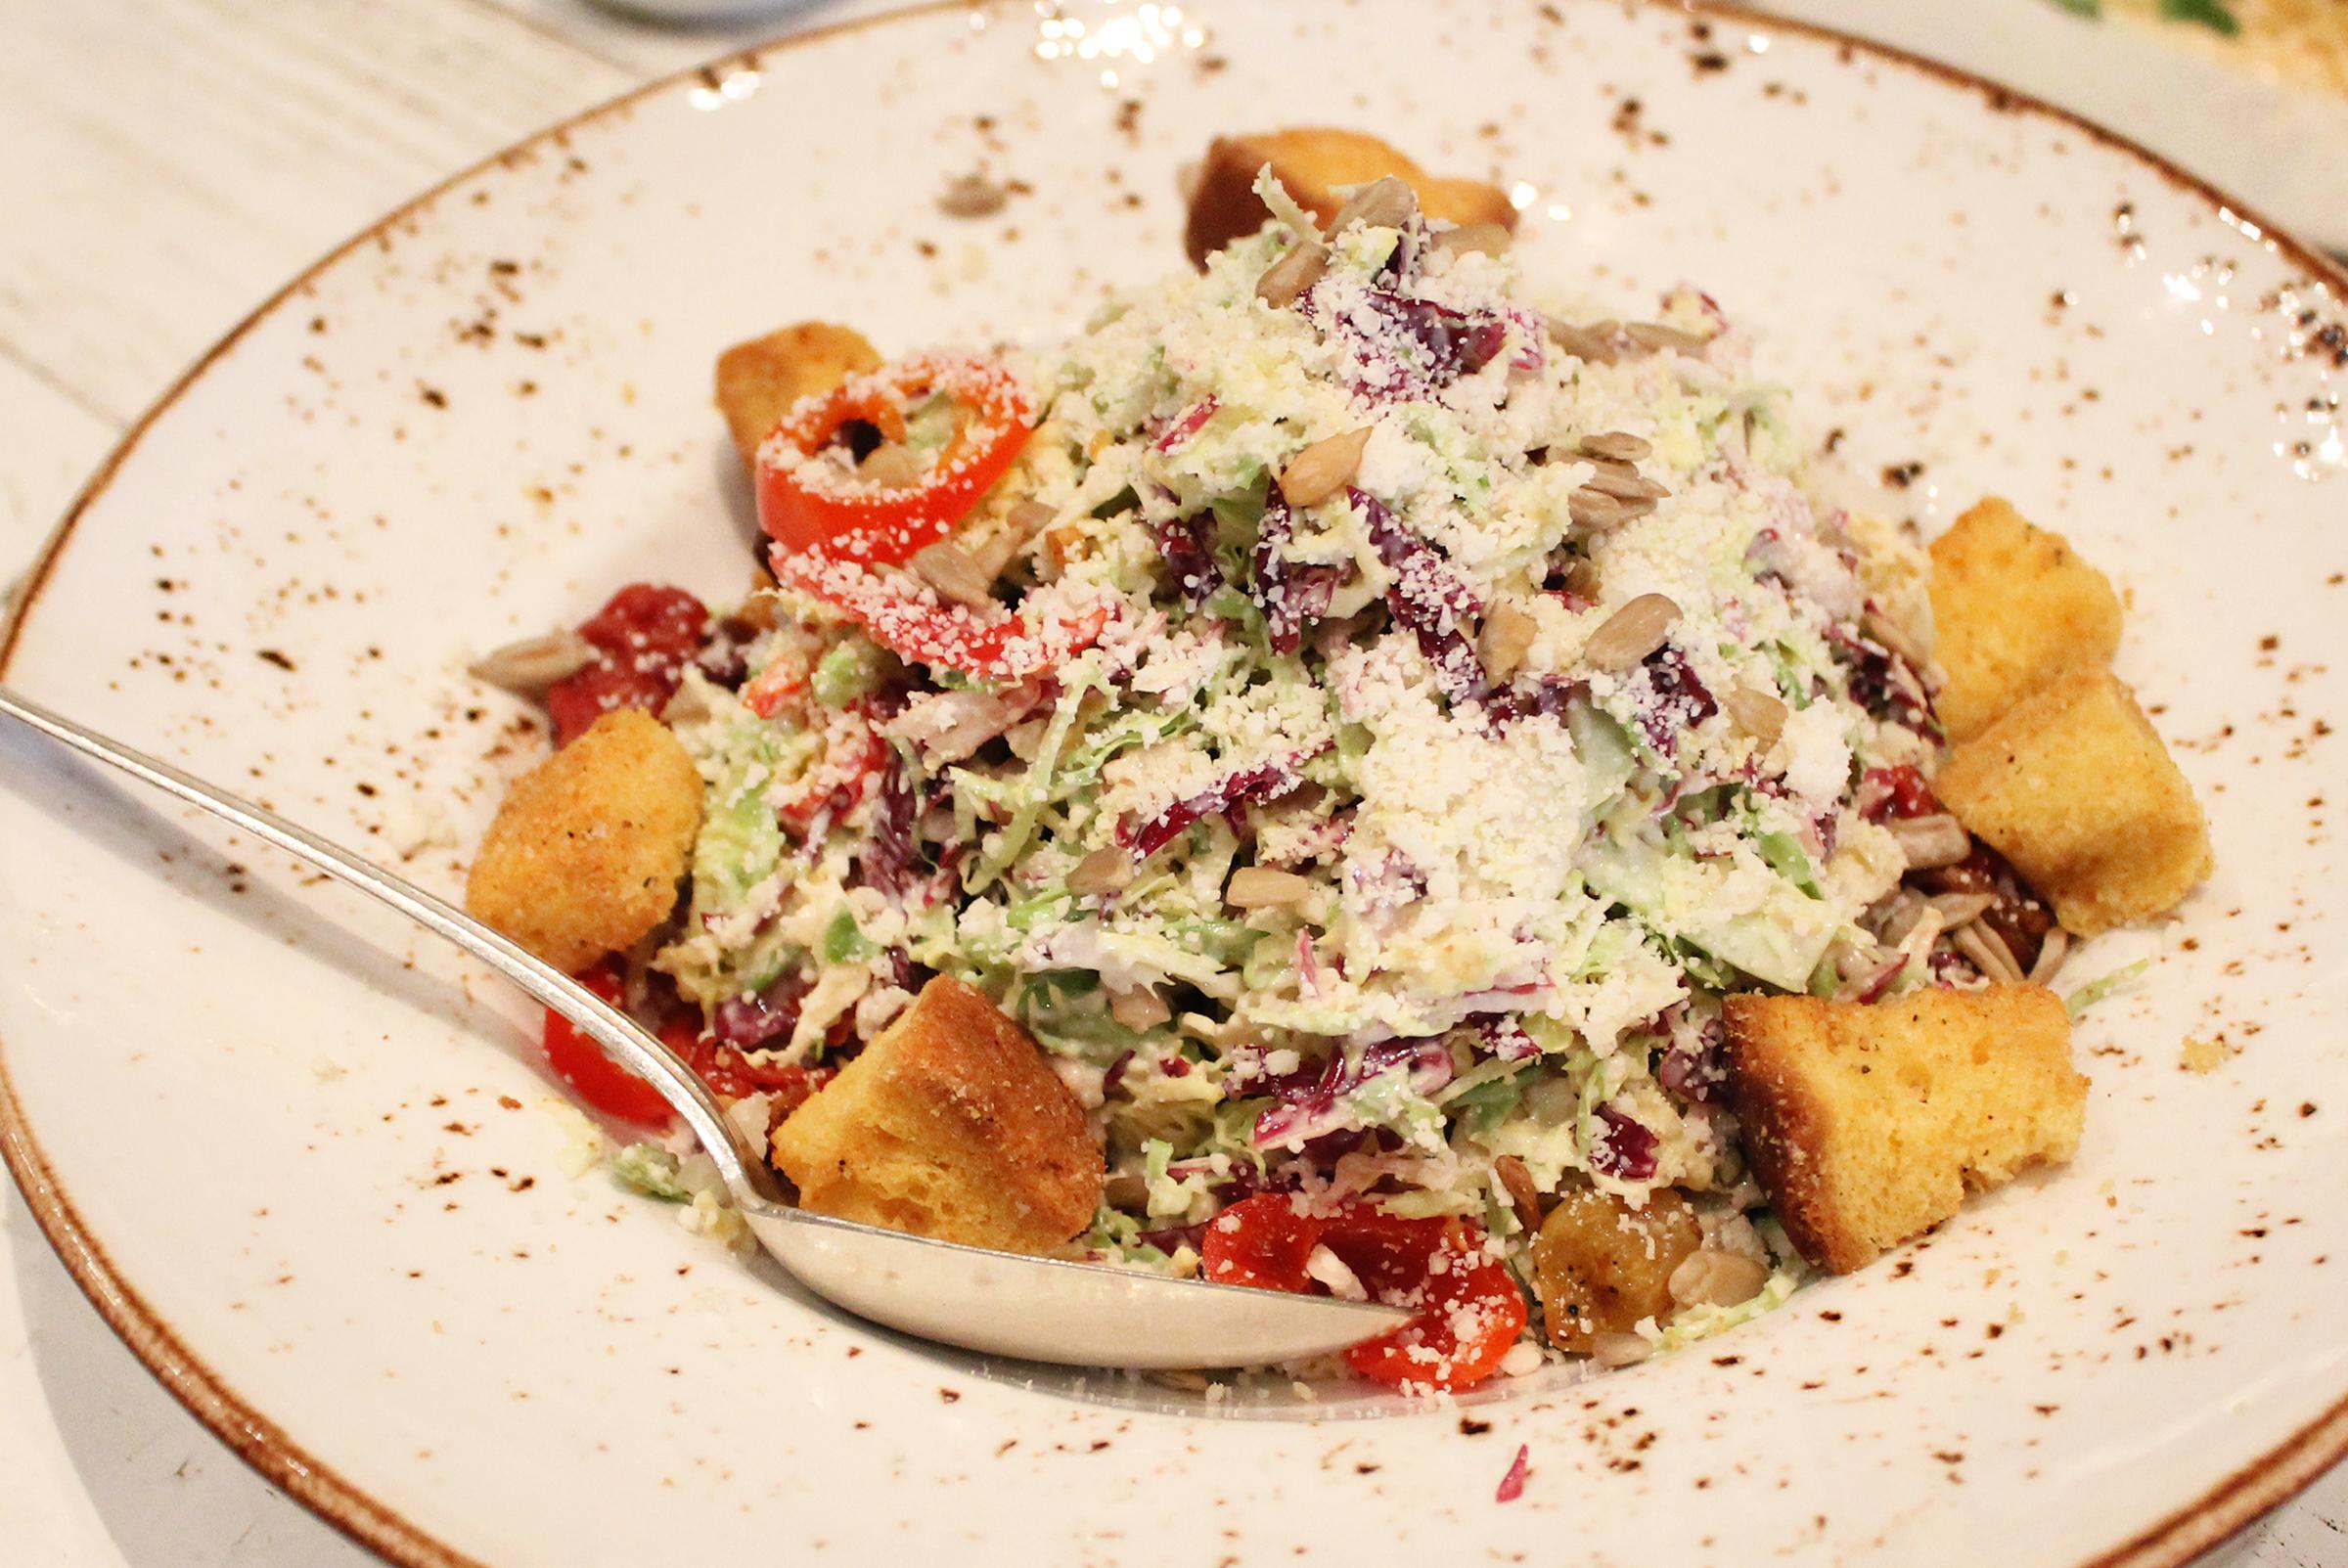 "BRUSSELS SPROUT ""CAESAR SALAD"": Tomato Raisins / Sunflower Seeds / Brioche Croutons / Parmesan Cheese"